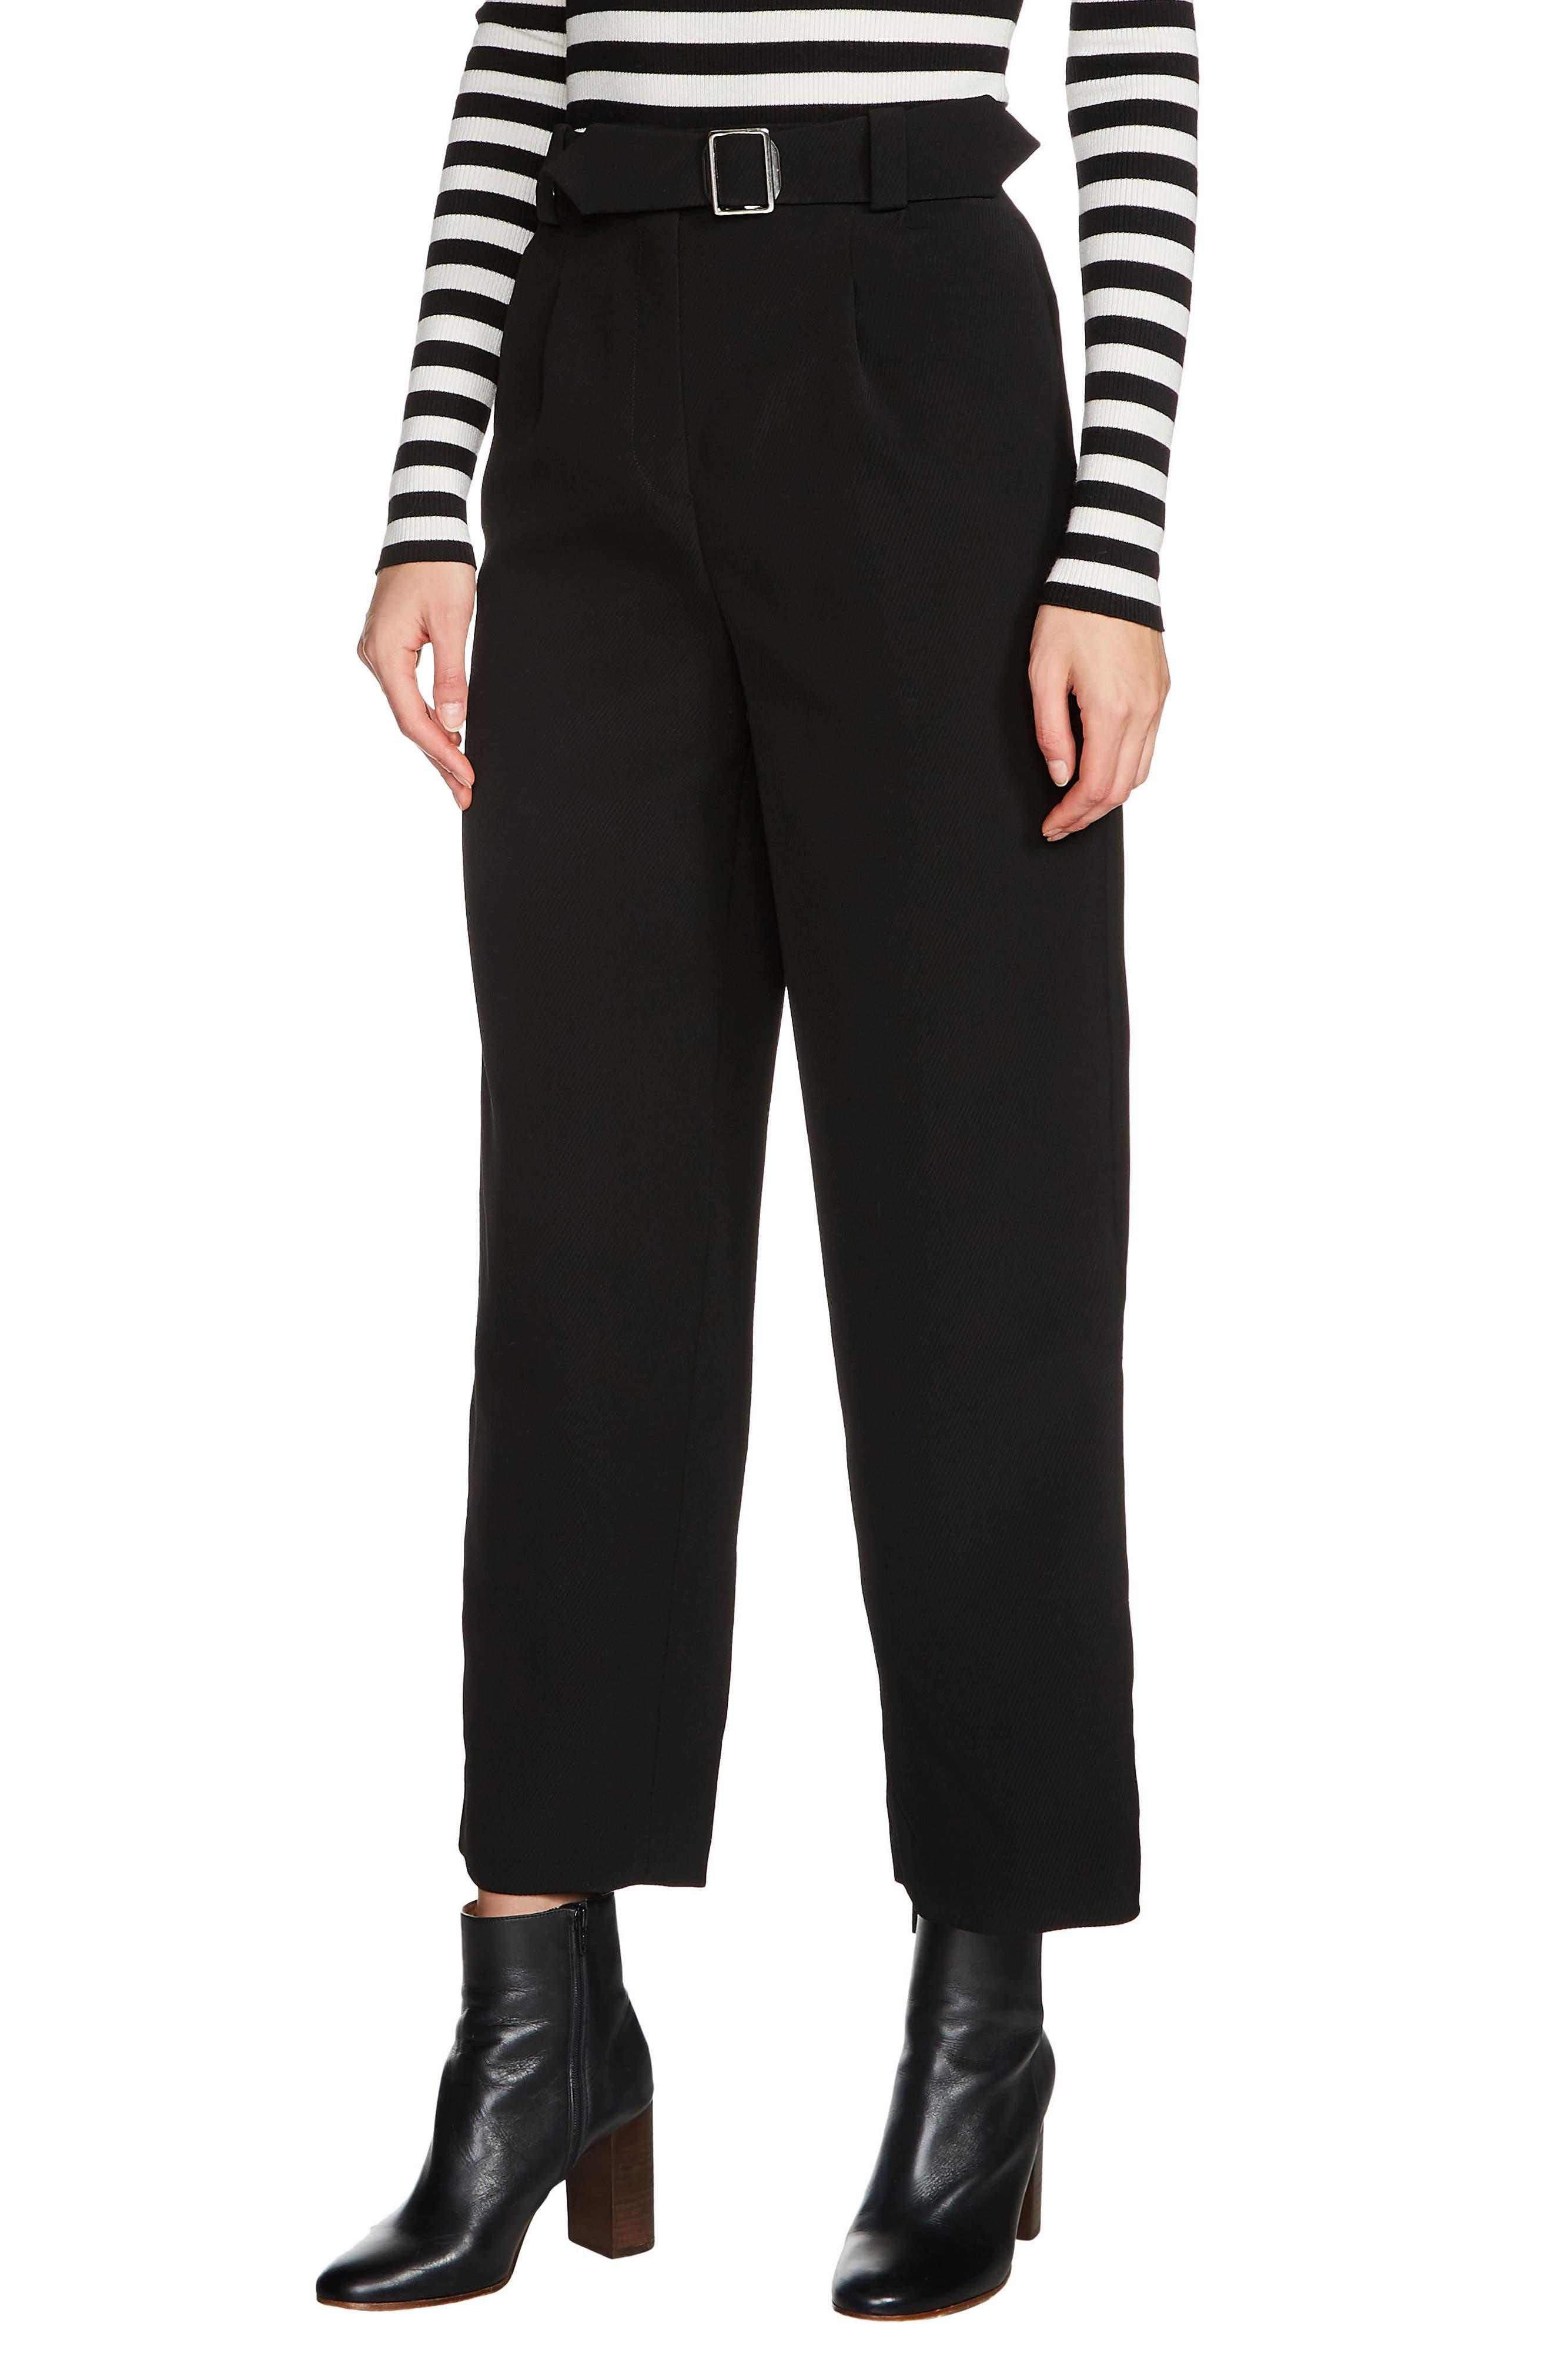 maje Belted High Waist Crop Pants